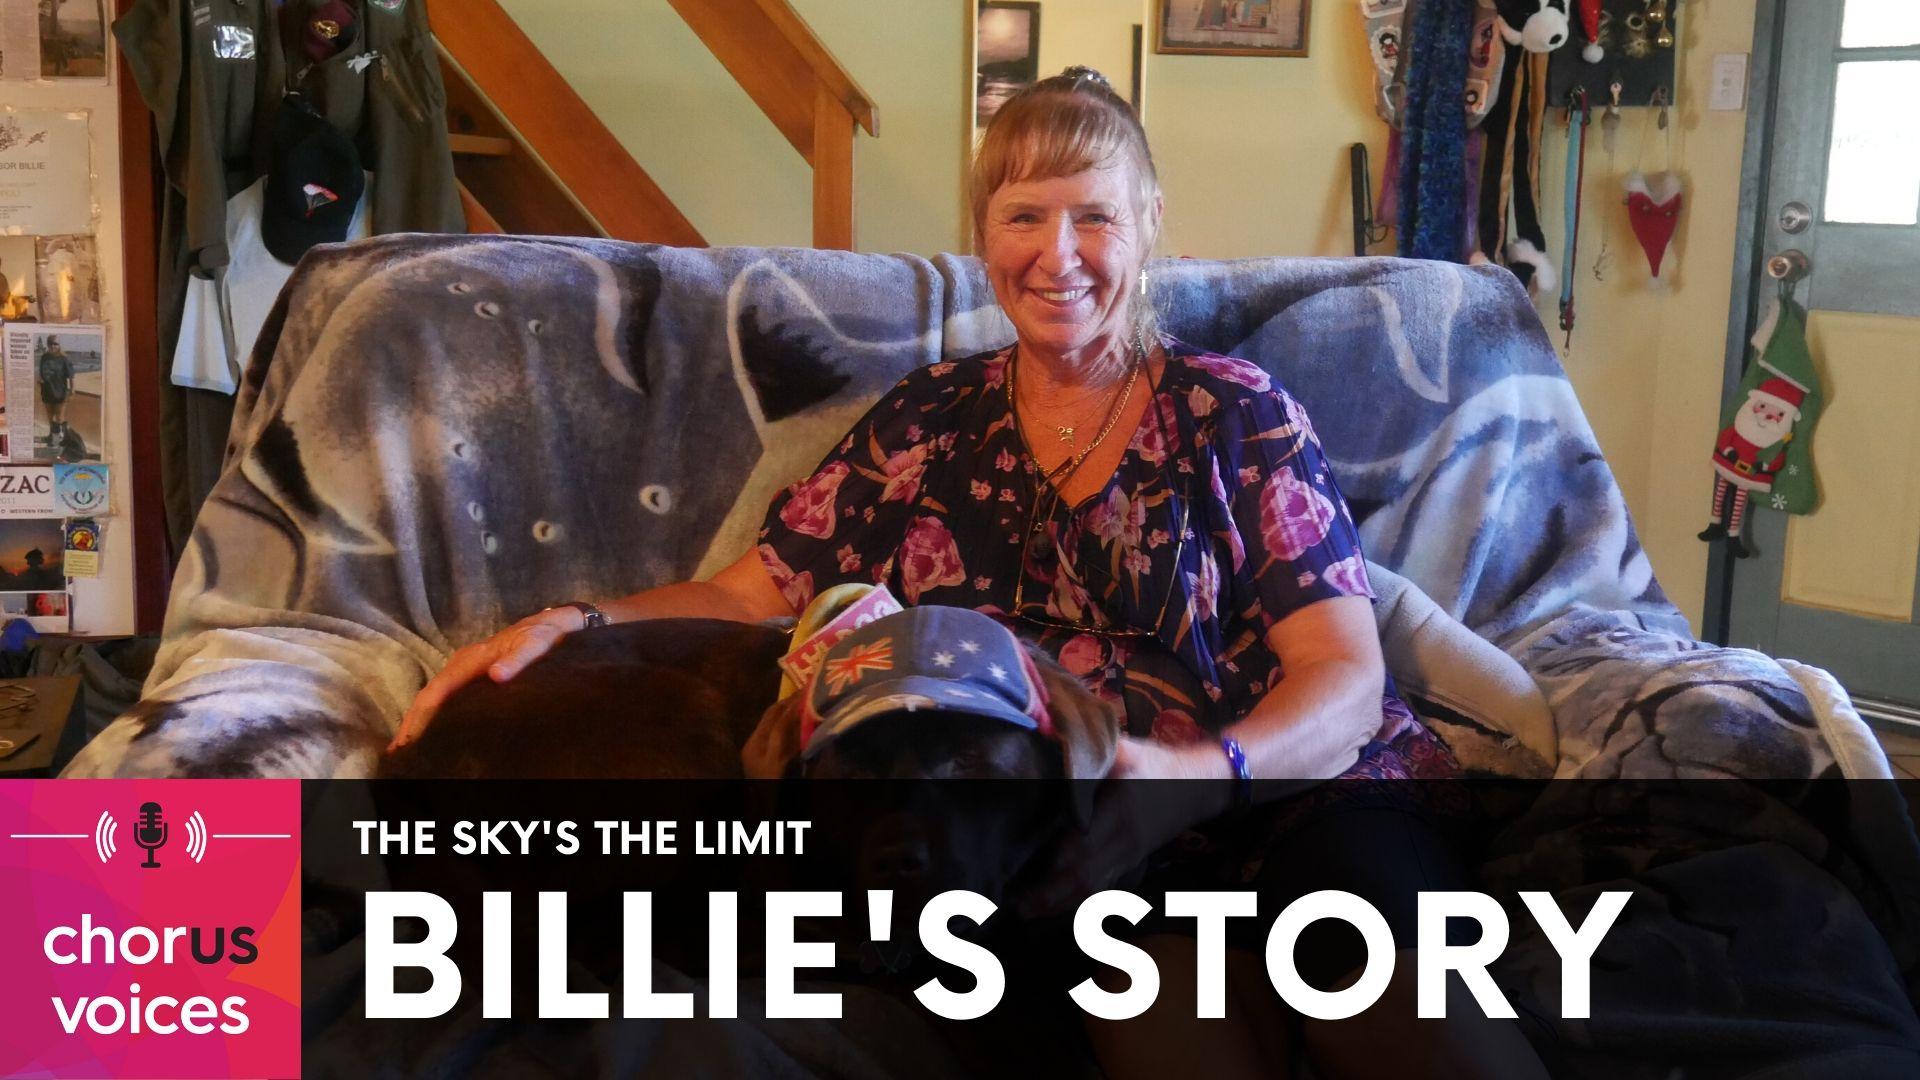 The Sky's the Limit - Billie's Story